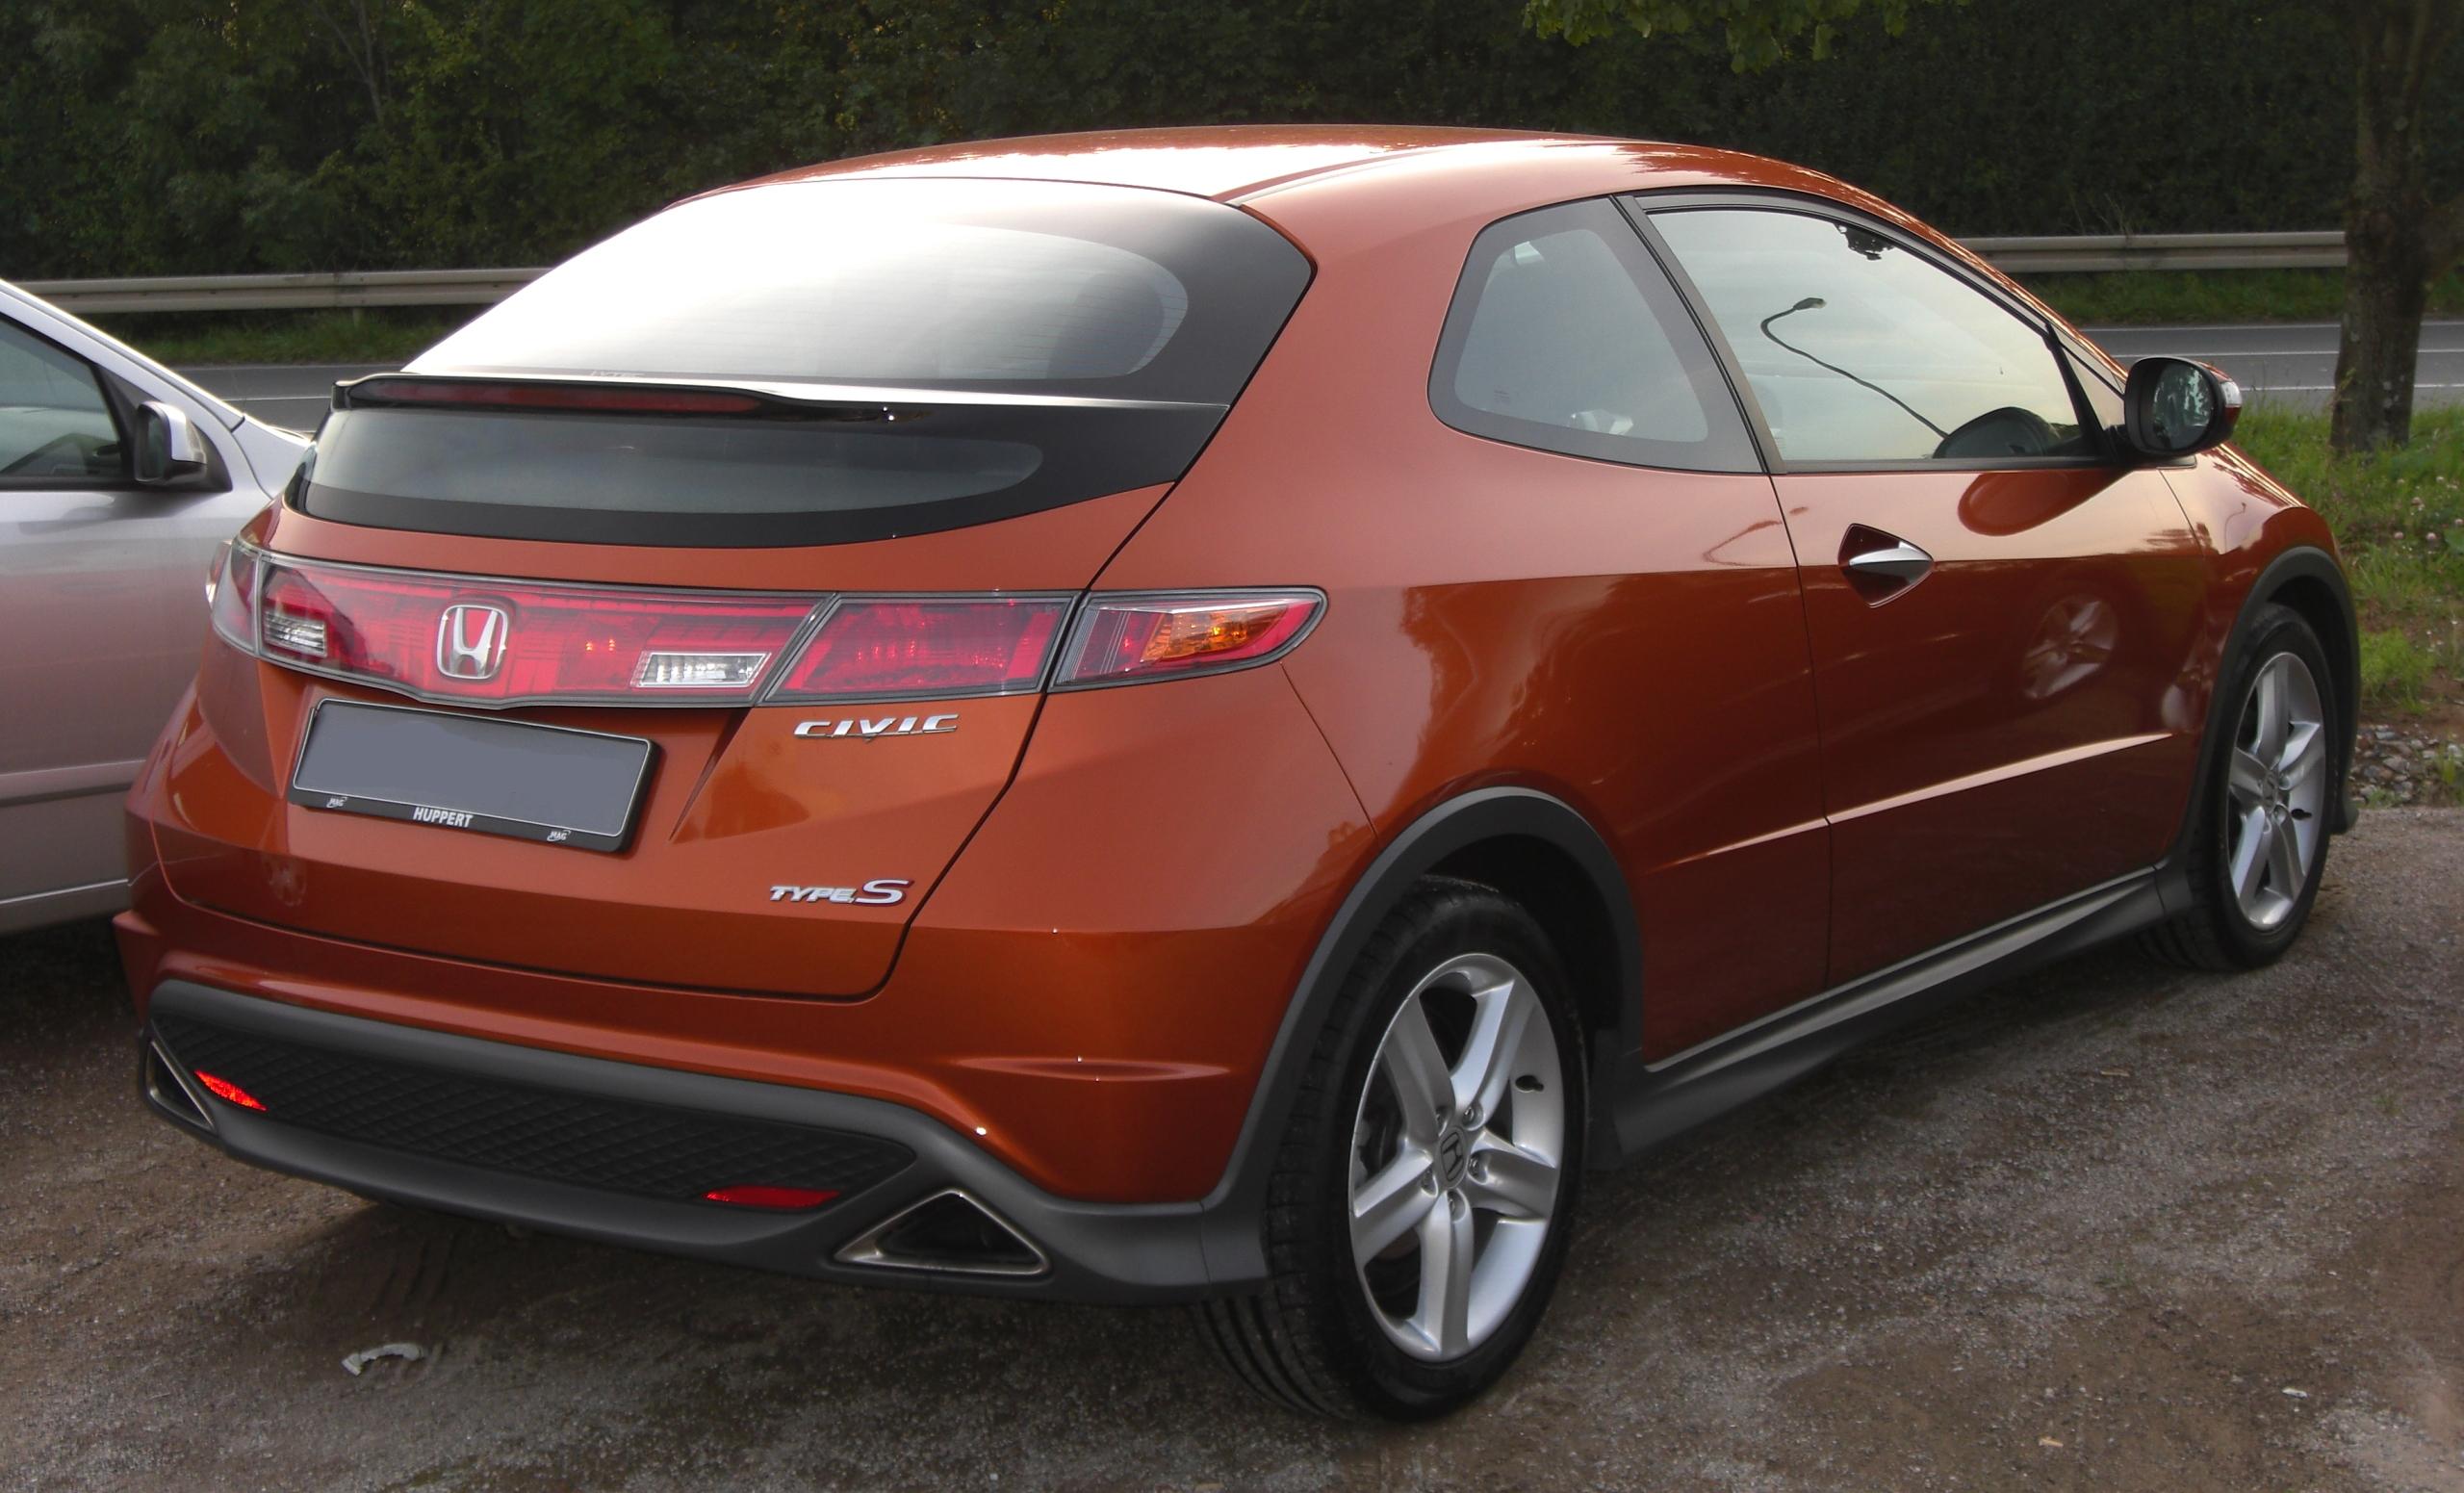 Honda Civic Eighth Generation Wikiwand 20062007 Ridgeline Electrical Troubleshooting Manual Original